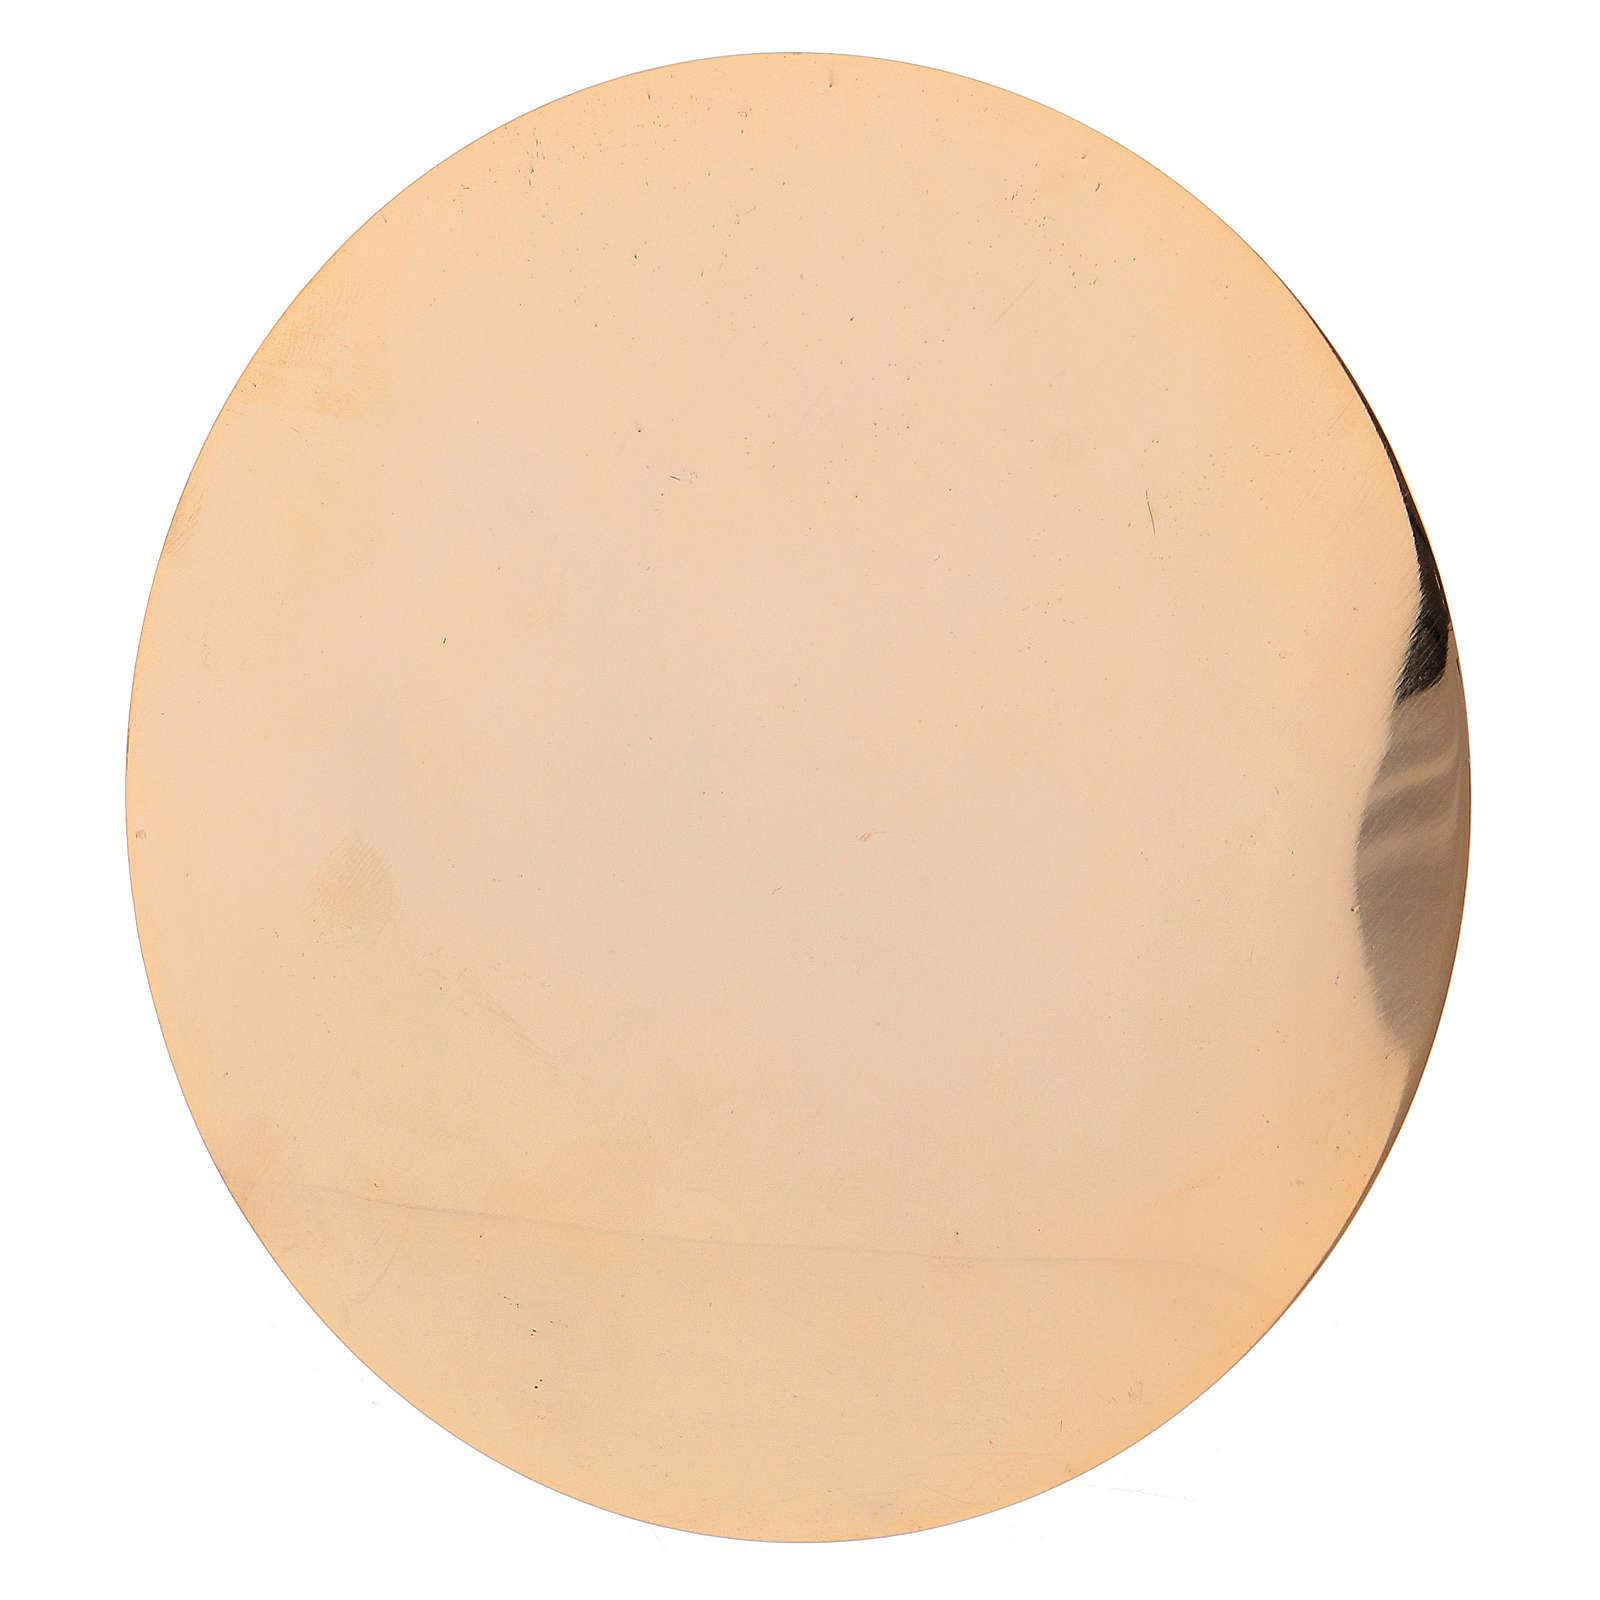 Cáliz y Patena de latón dorado con motivo tallado 20 cm 4